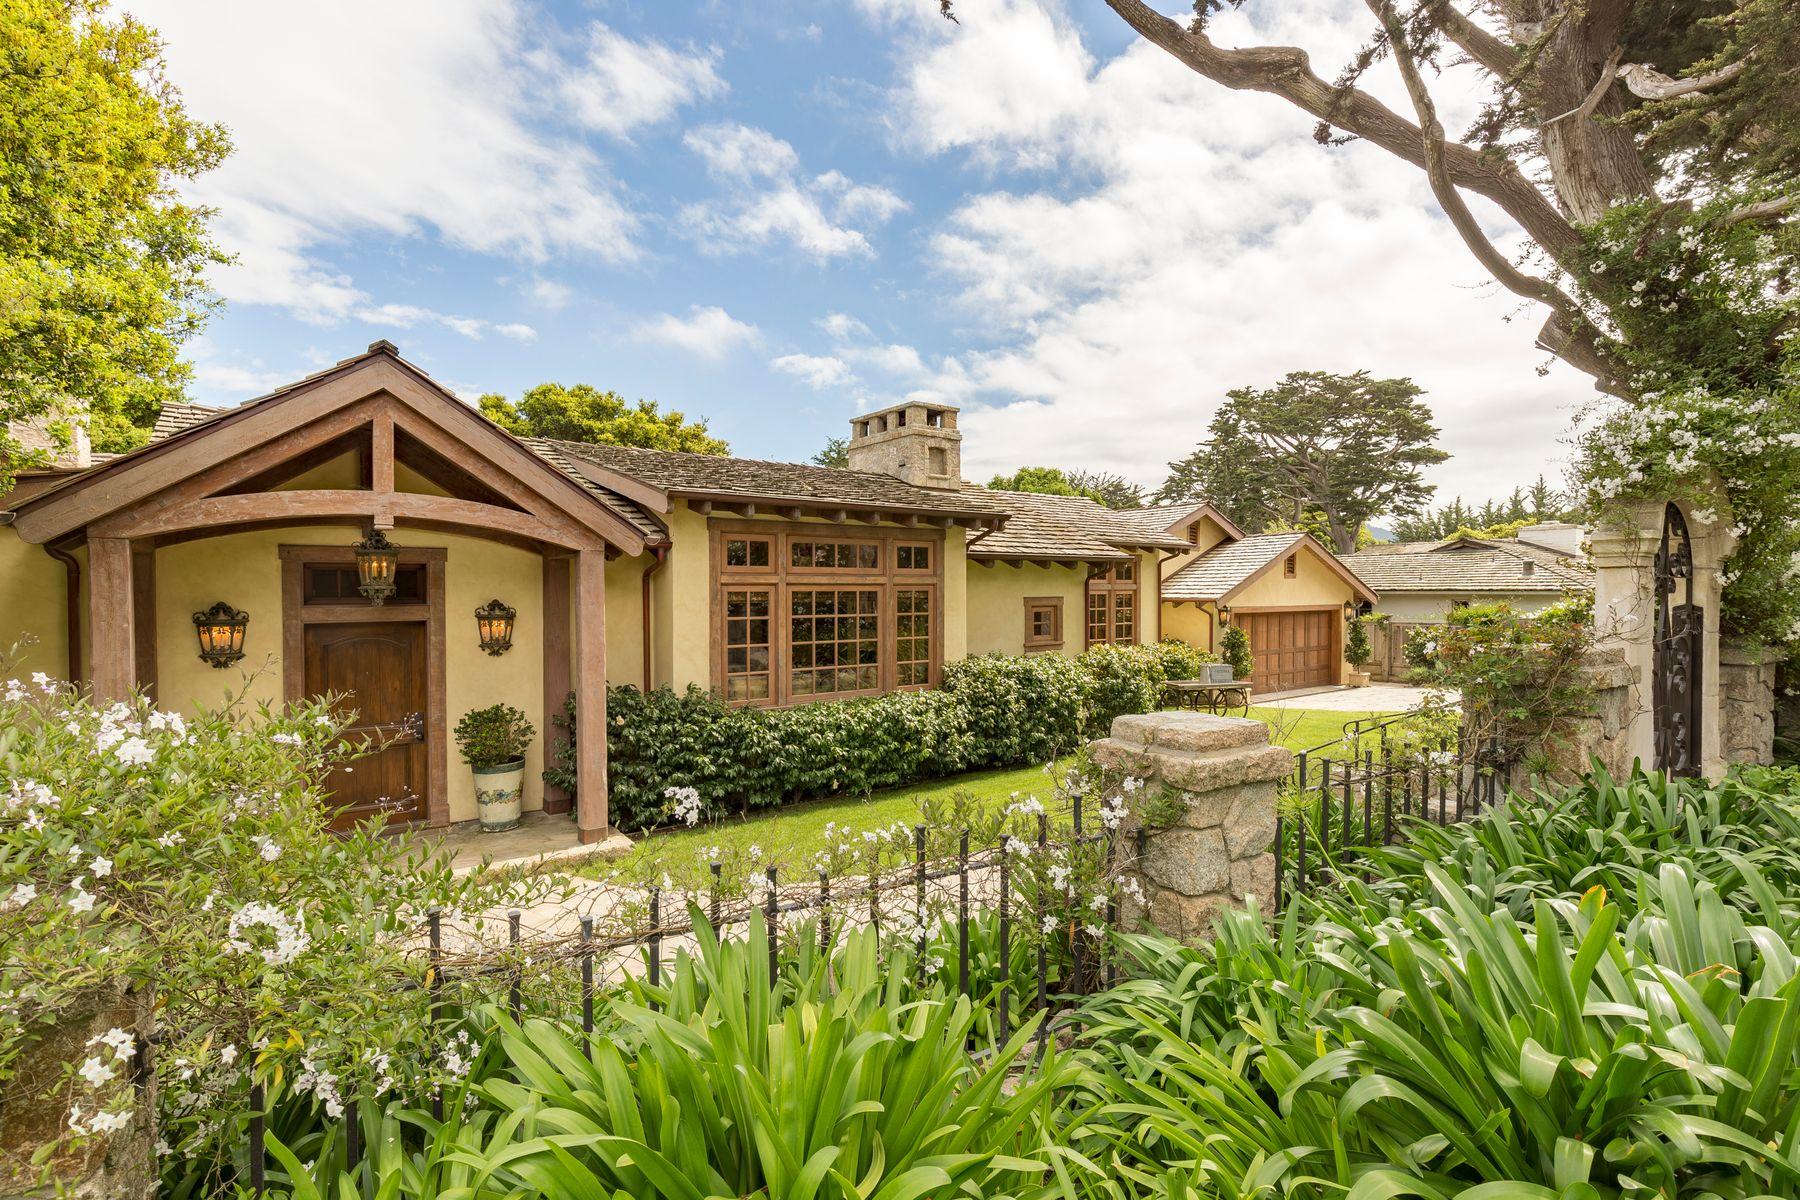 Single Family Homes for Sale at Carmel Elegance 26325 Isabella Avenue Carmel, California 93923 United States